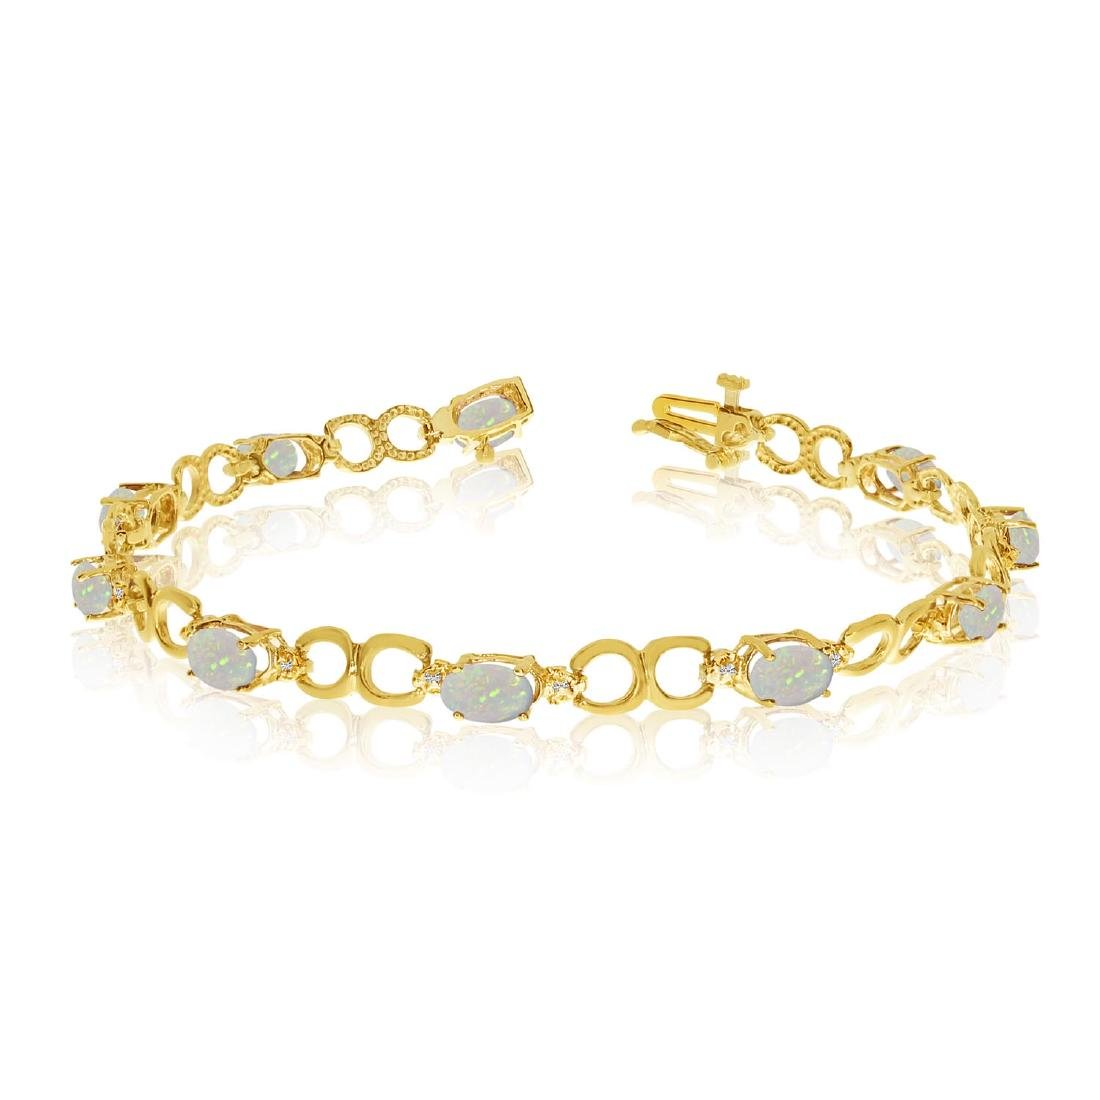 Certified 10K Yellow Gold Oval Opal and Diamond Bracele